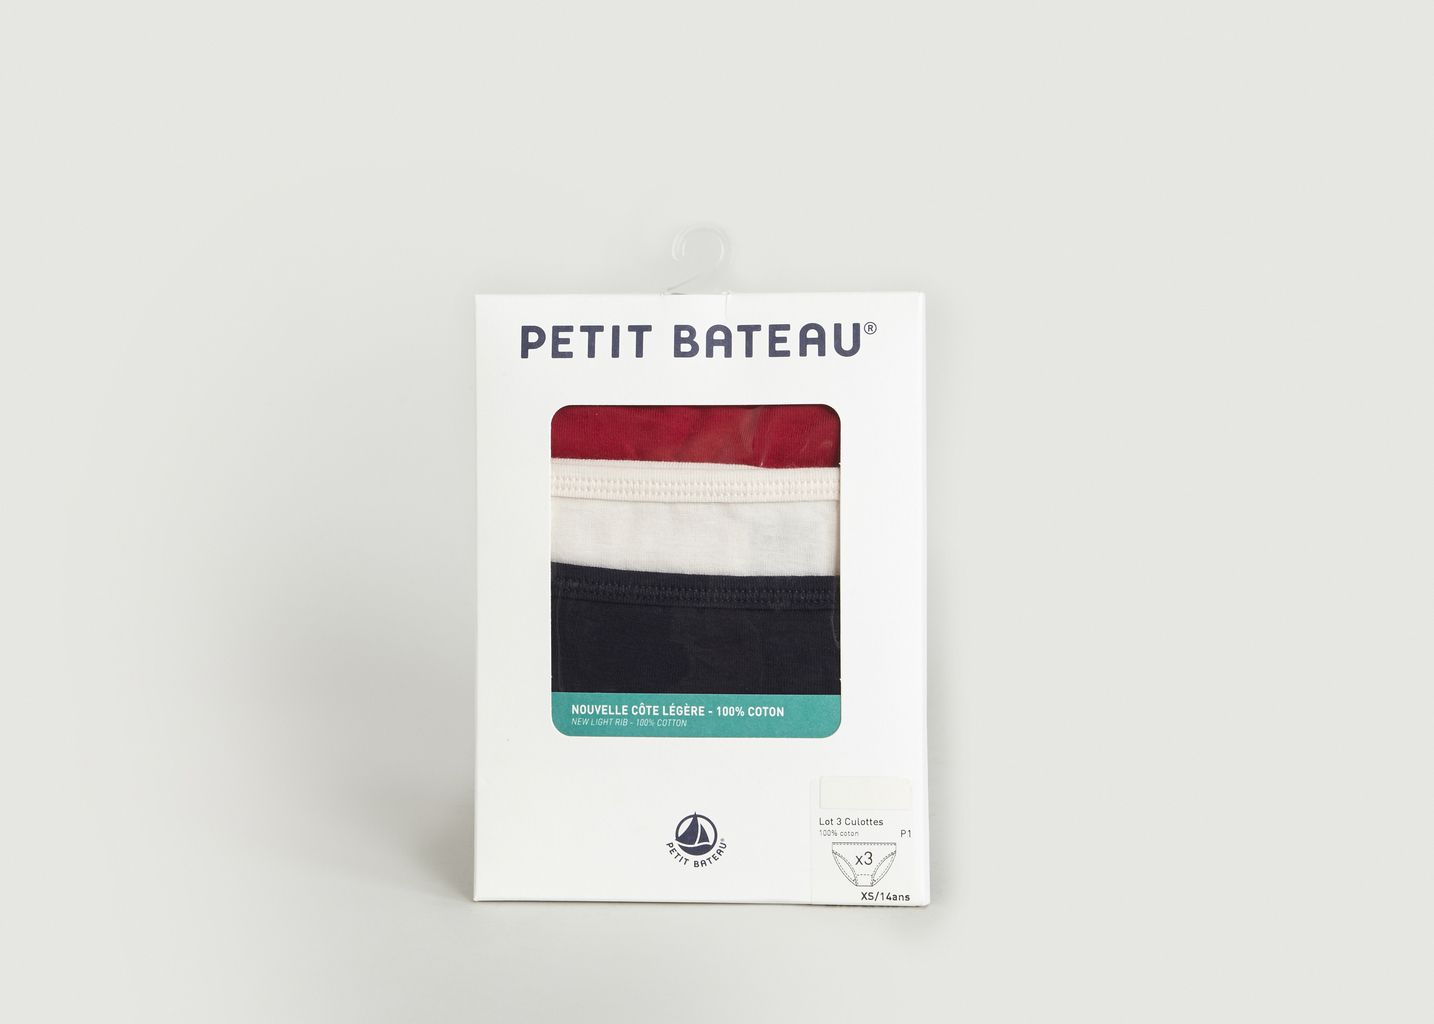 Lot 3 Culottes - Petit Bateau